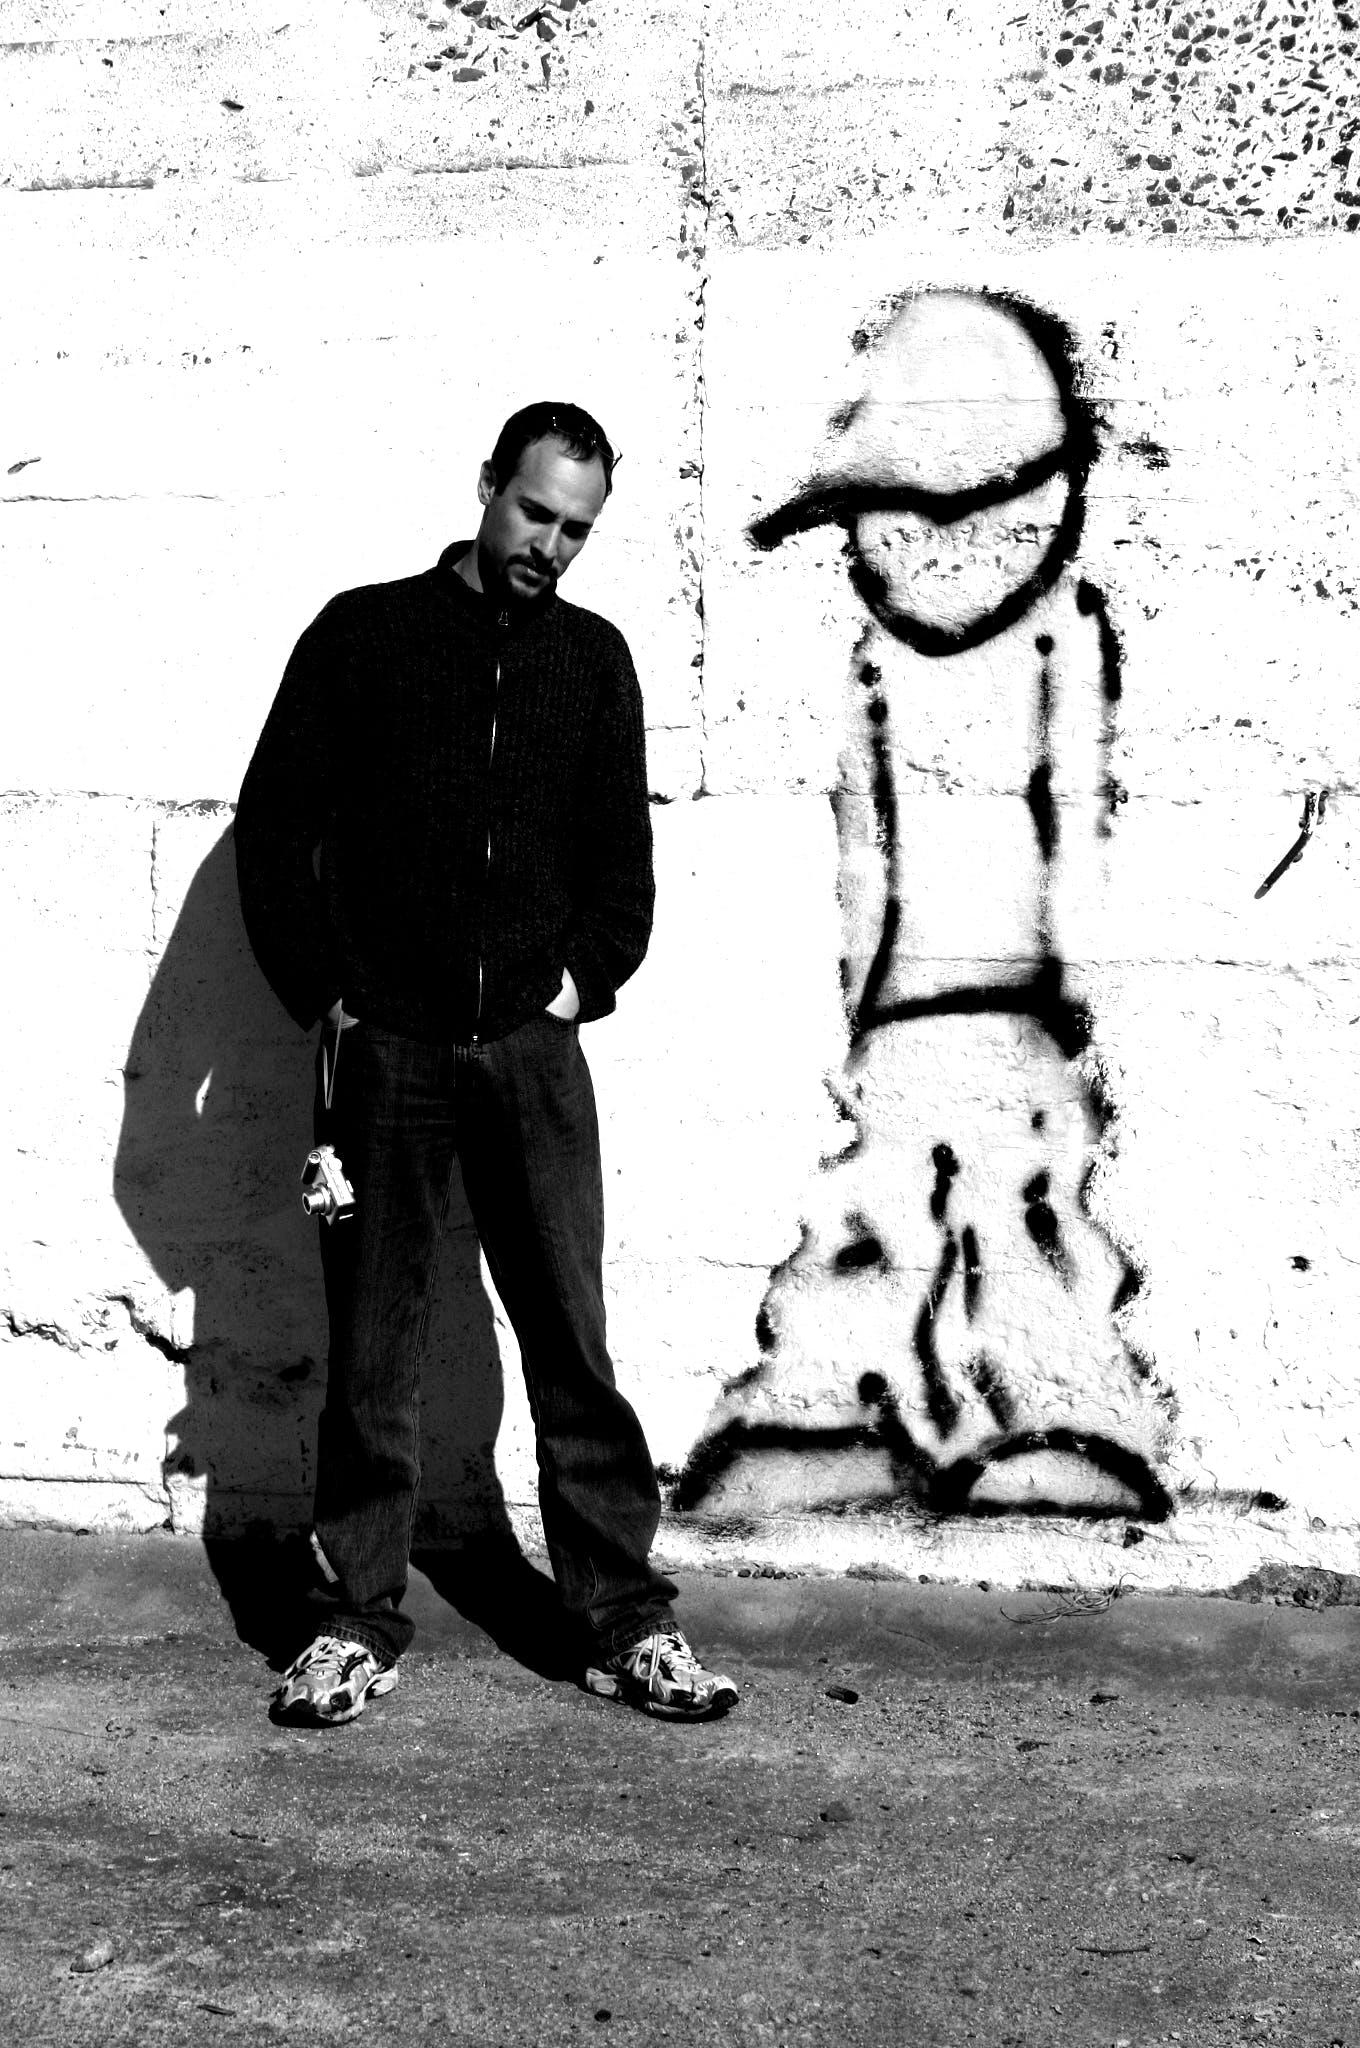 Free stock photo of contemplation, graffiti, portrait